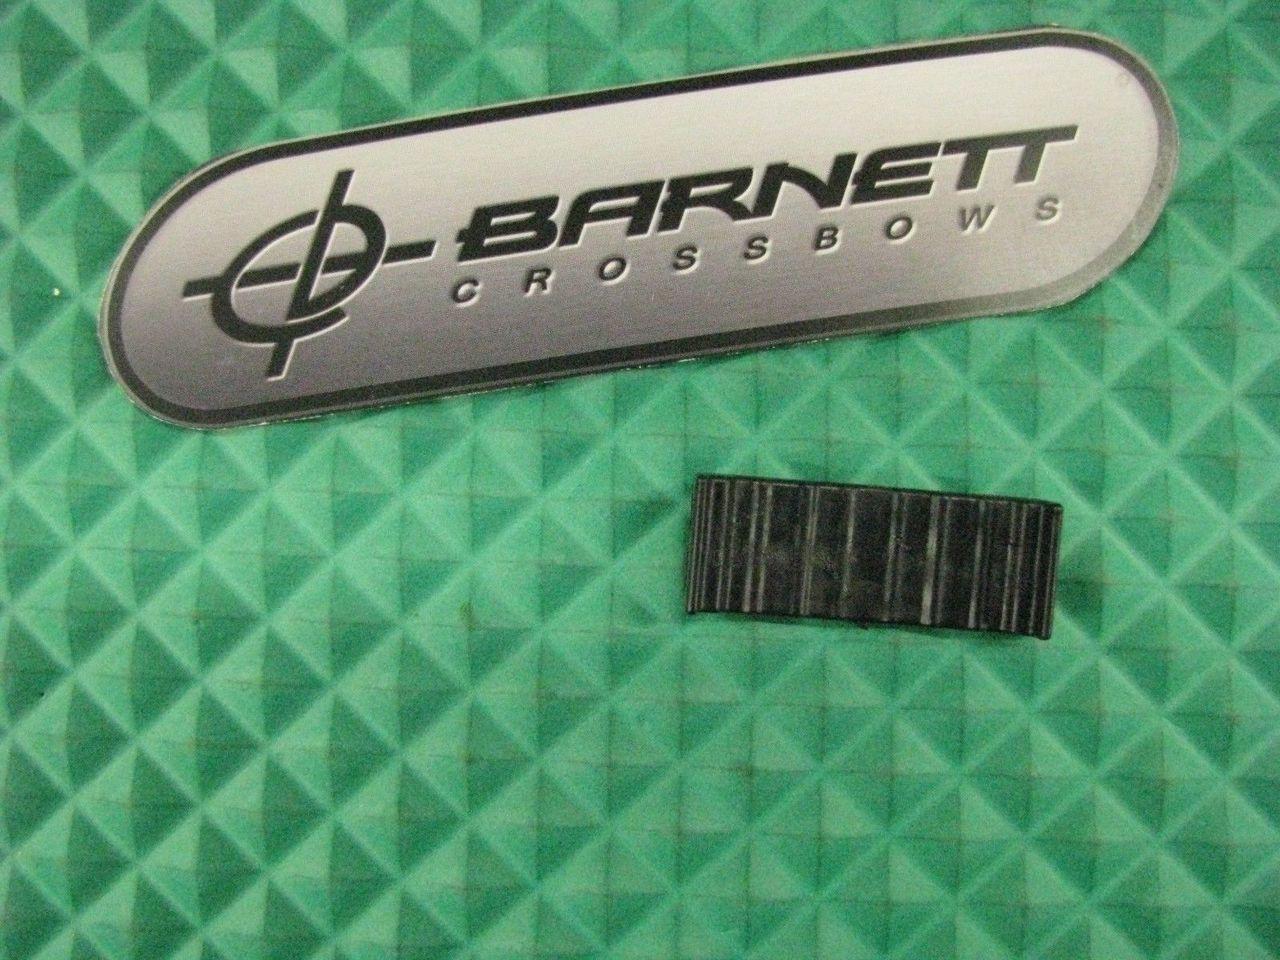 Barnett Crossbows Wildcat C5, Predator, Rev. Replacement Cable Slide Black S2417